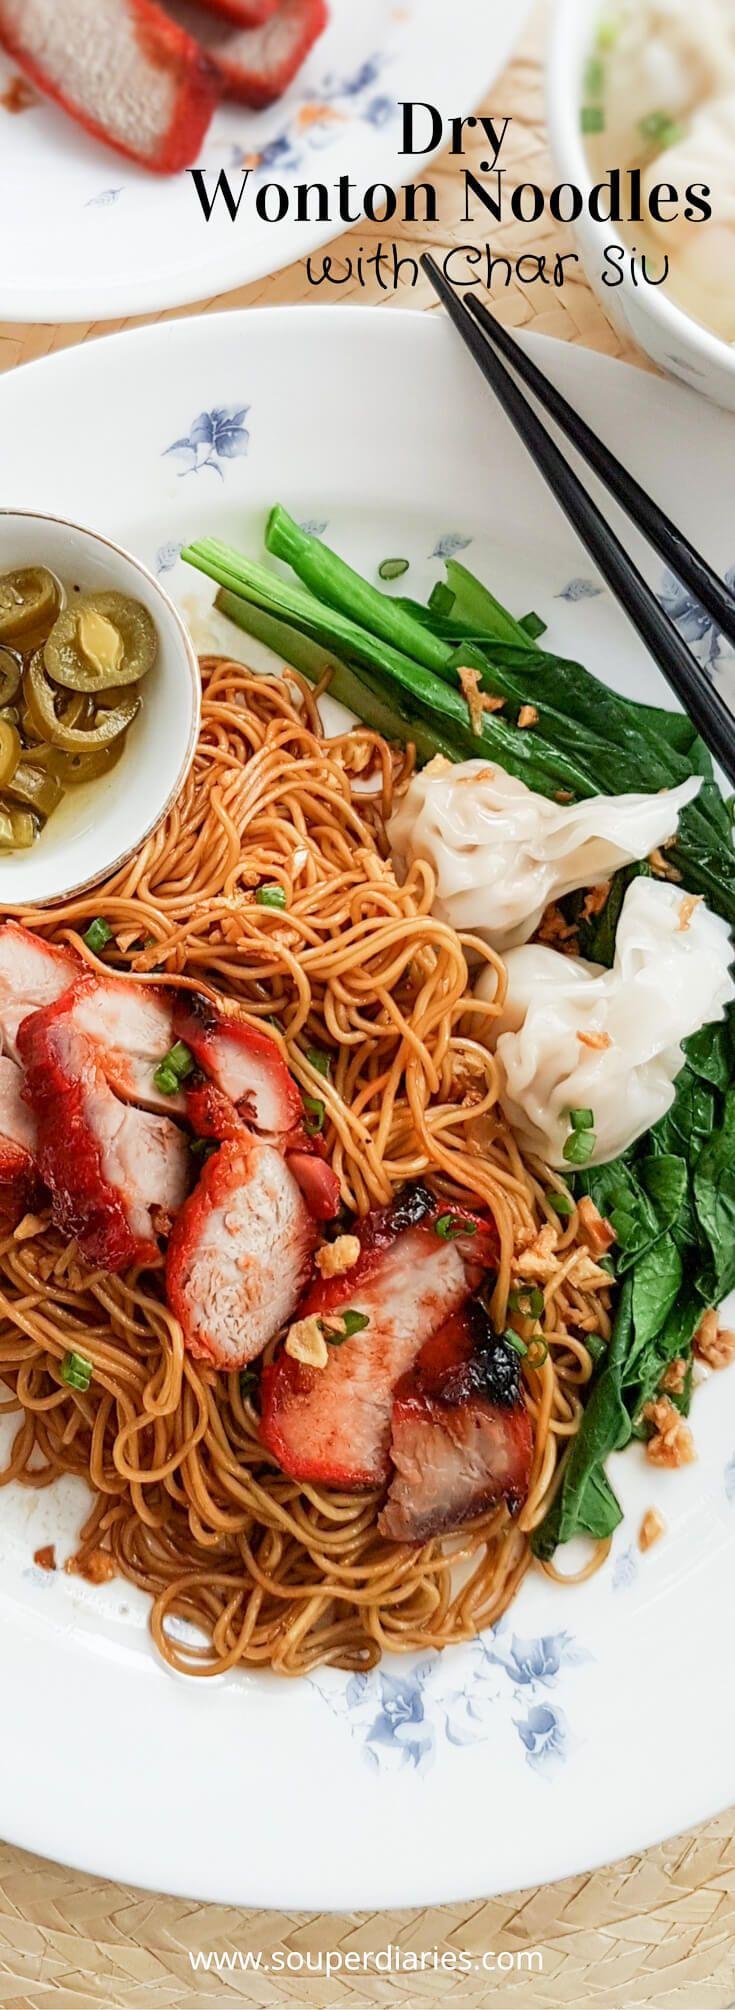 Dry wonton noodles recipe